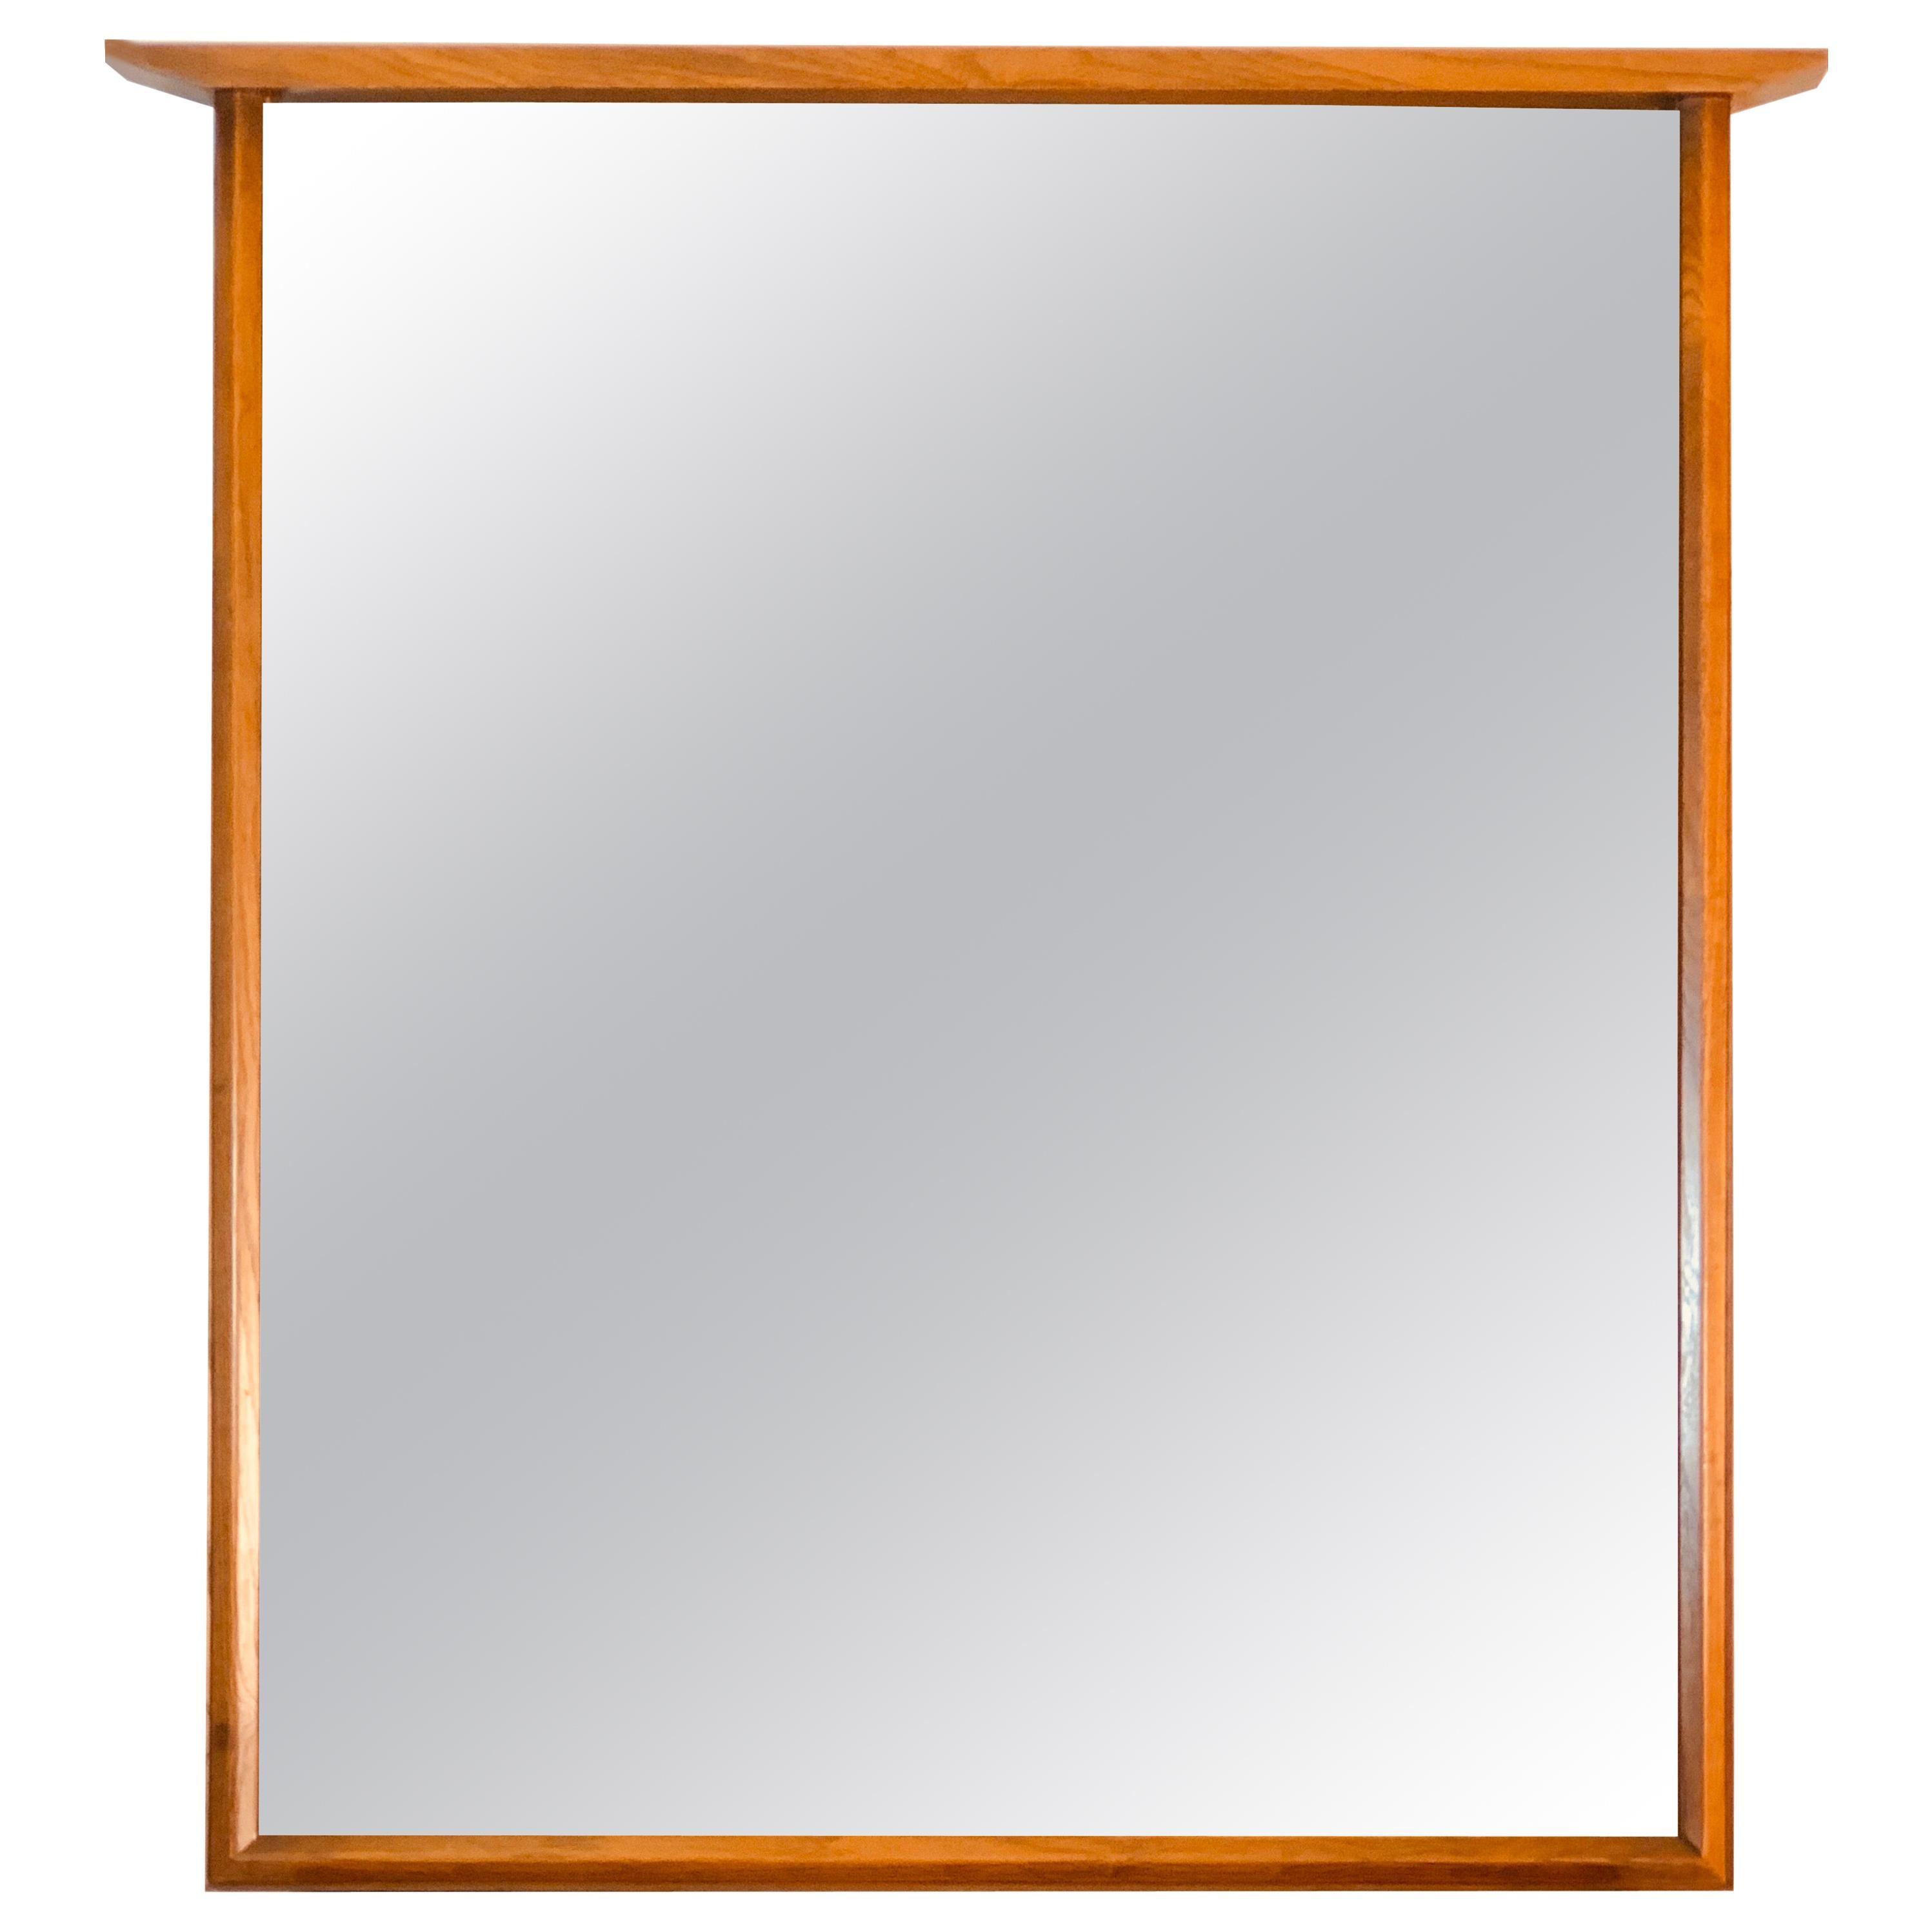 1960s Beveled Wood Wall Mirror